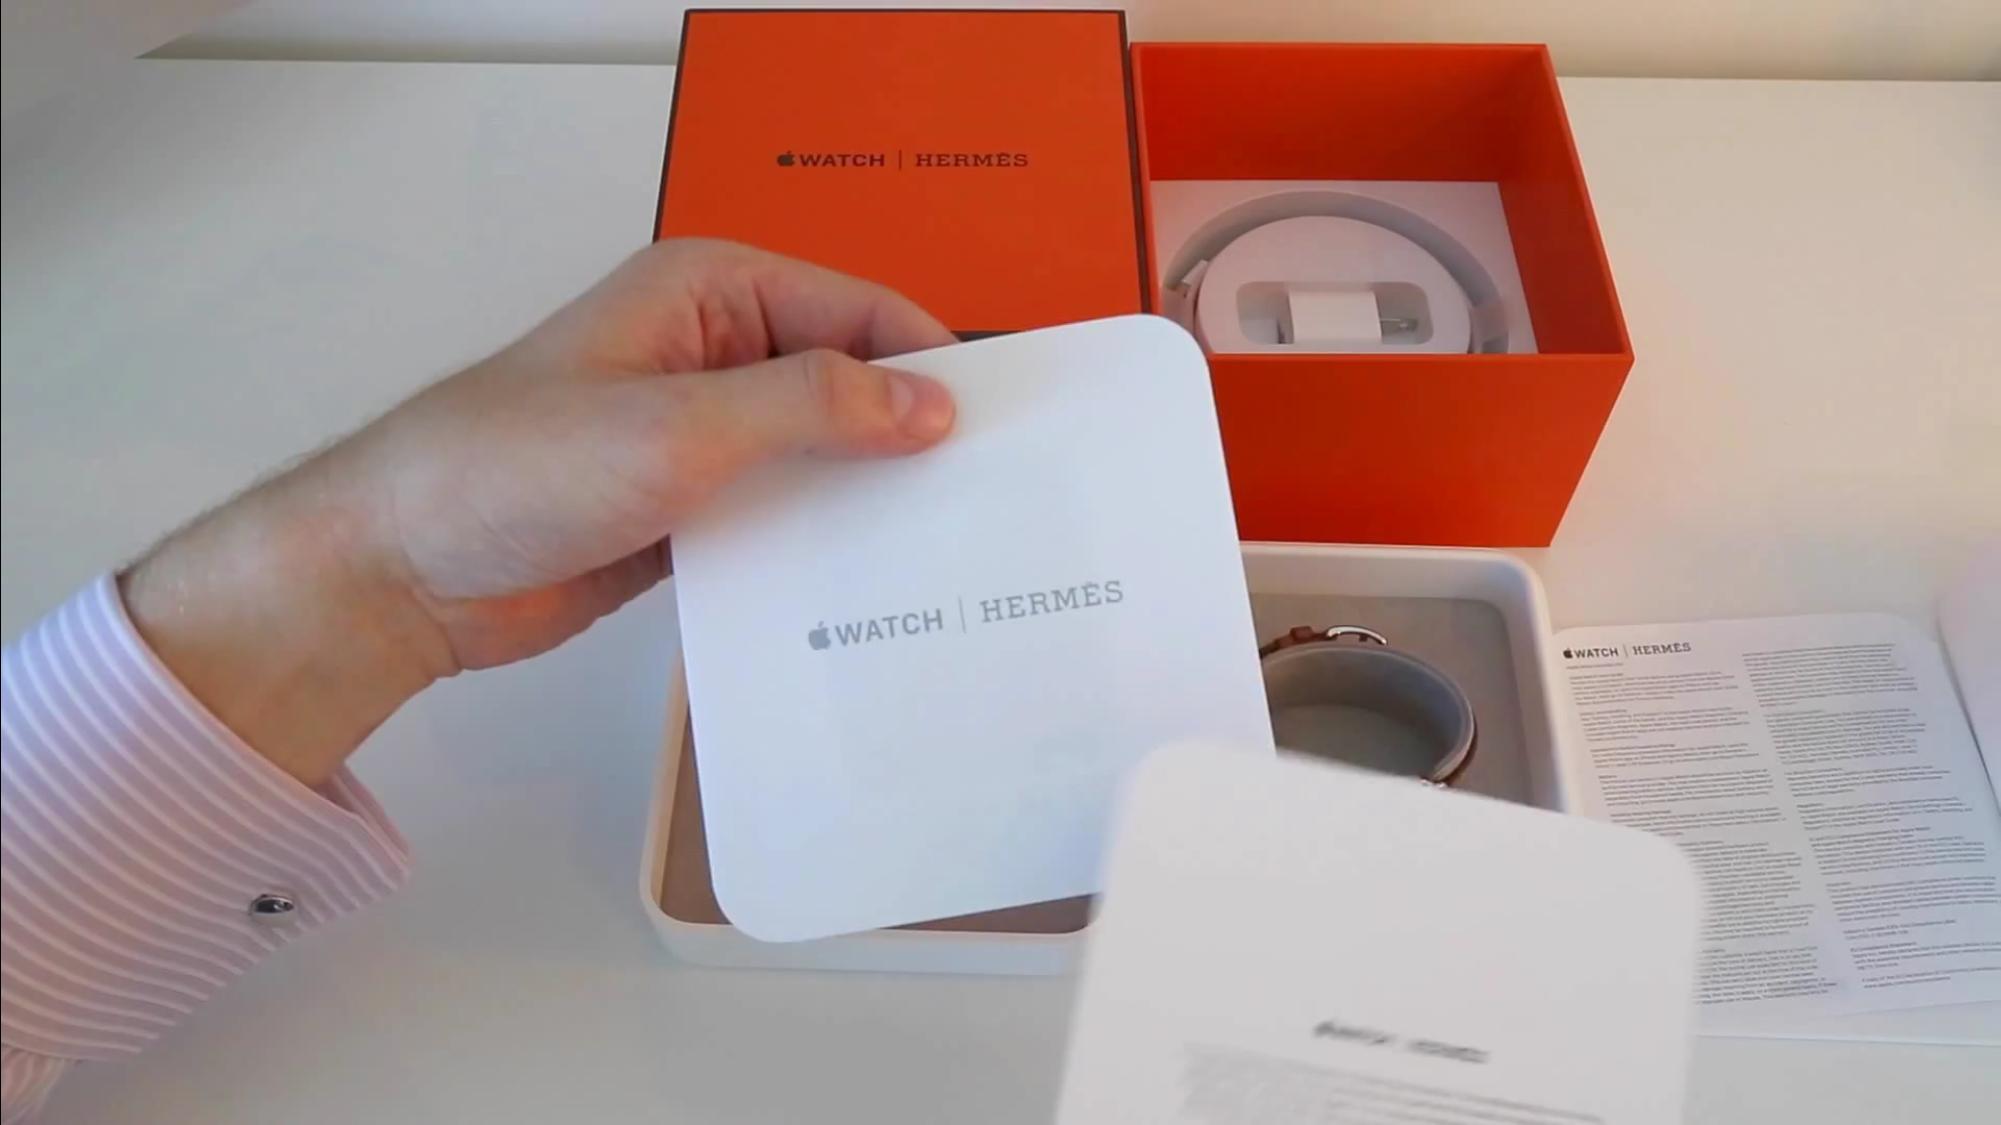 Apple Watch Hermes unboxing